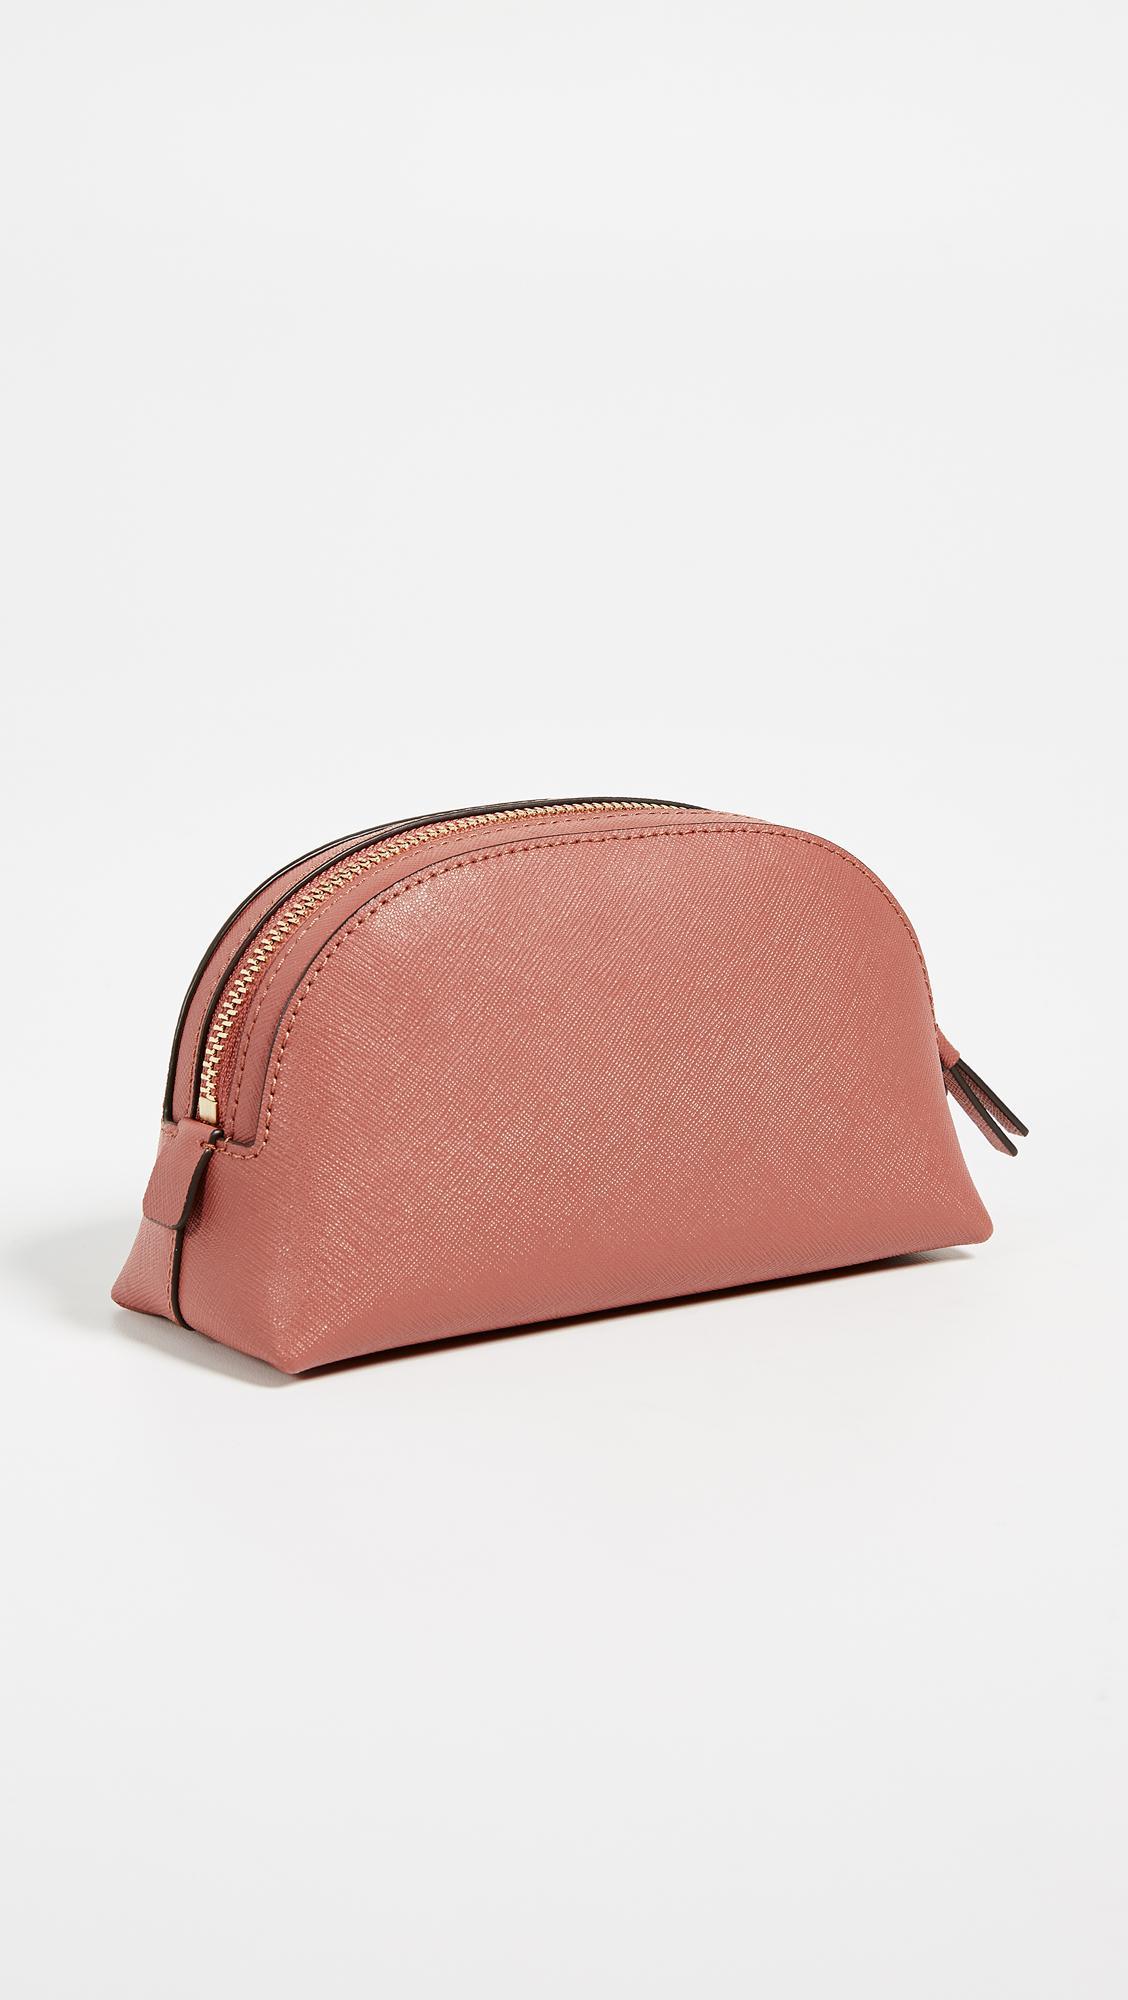 42d8c8aaaf33 Lyst - Tory Burch Robinson Small Makeup Bag